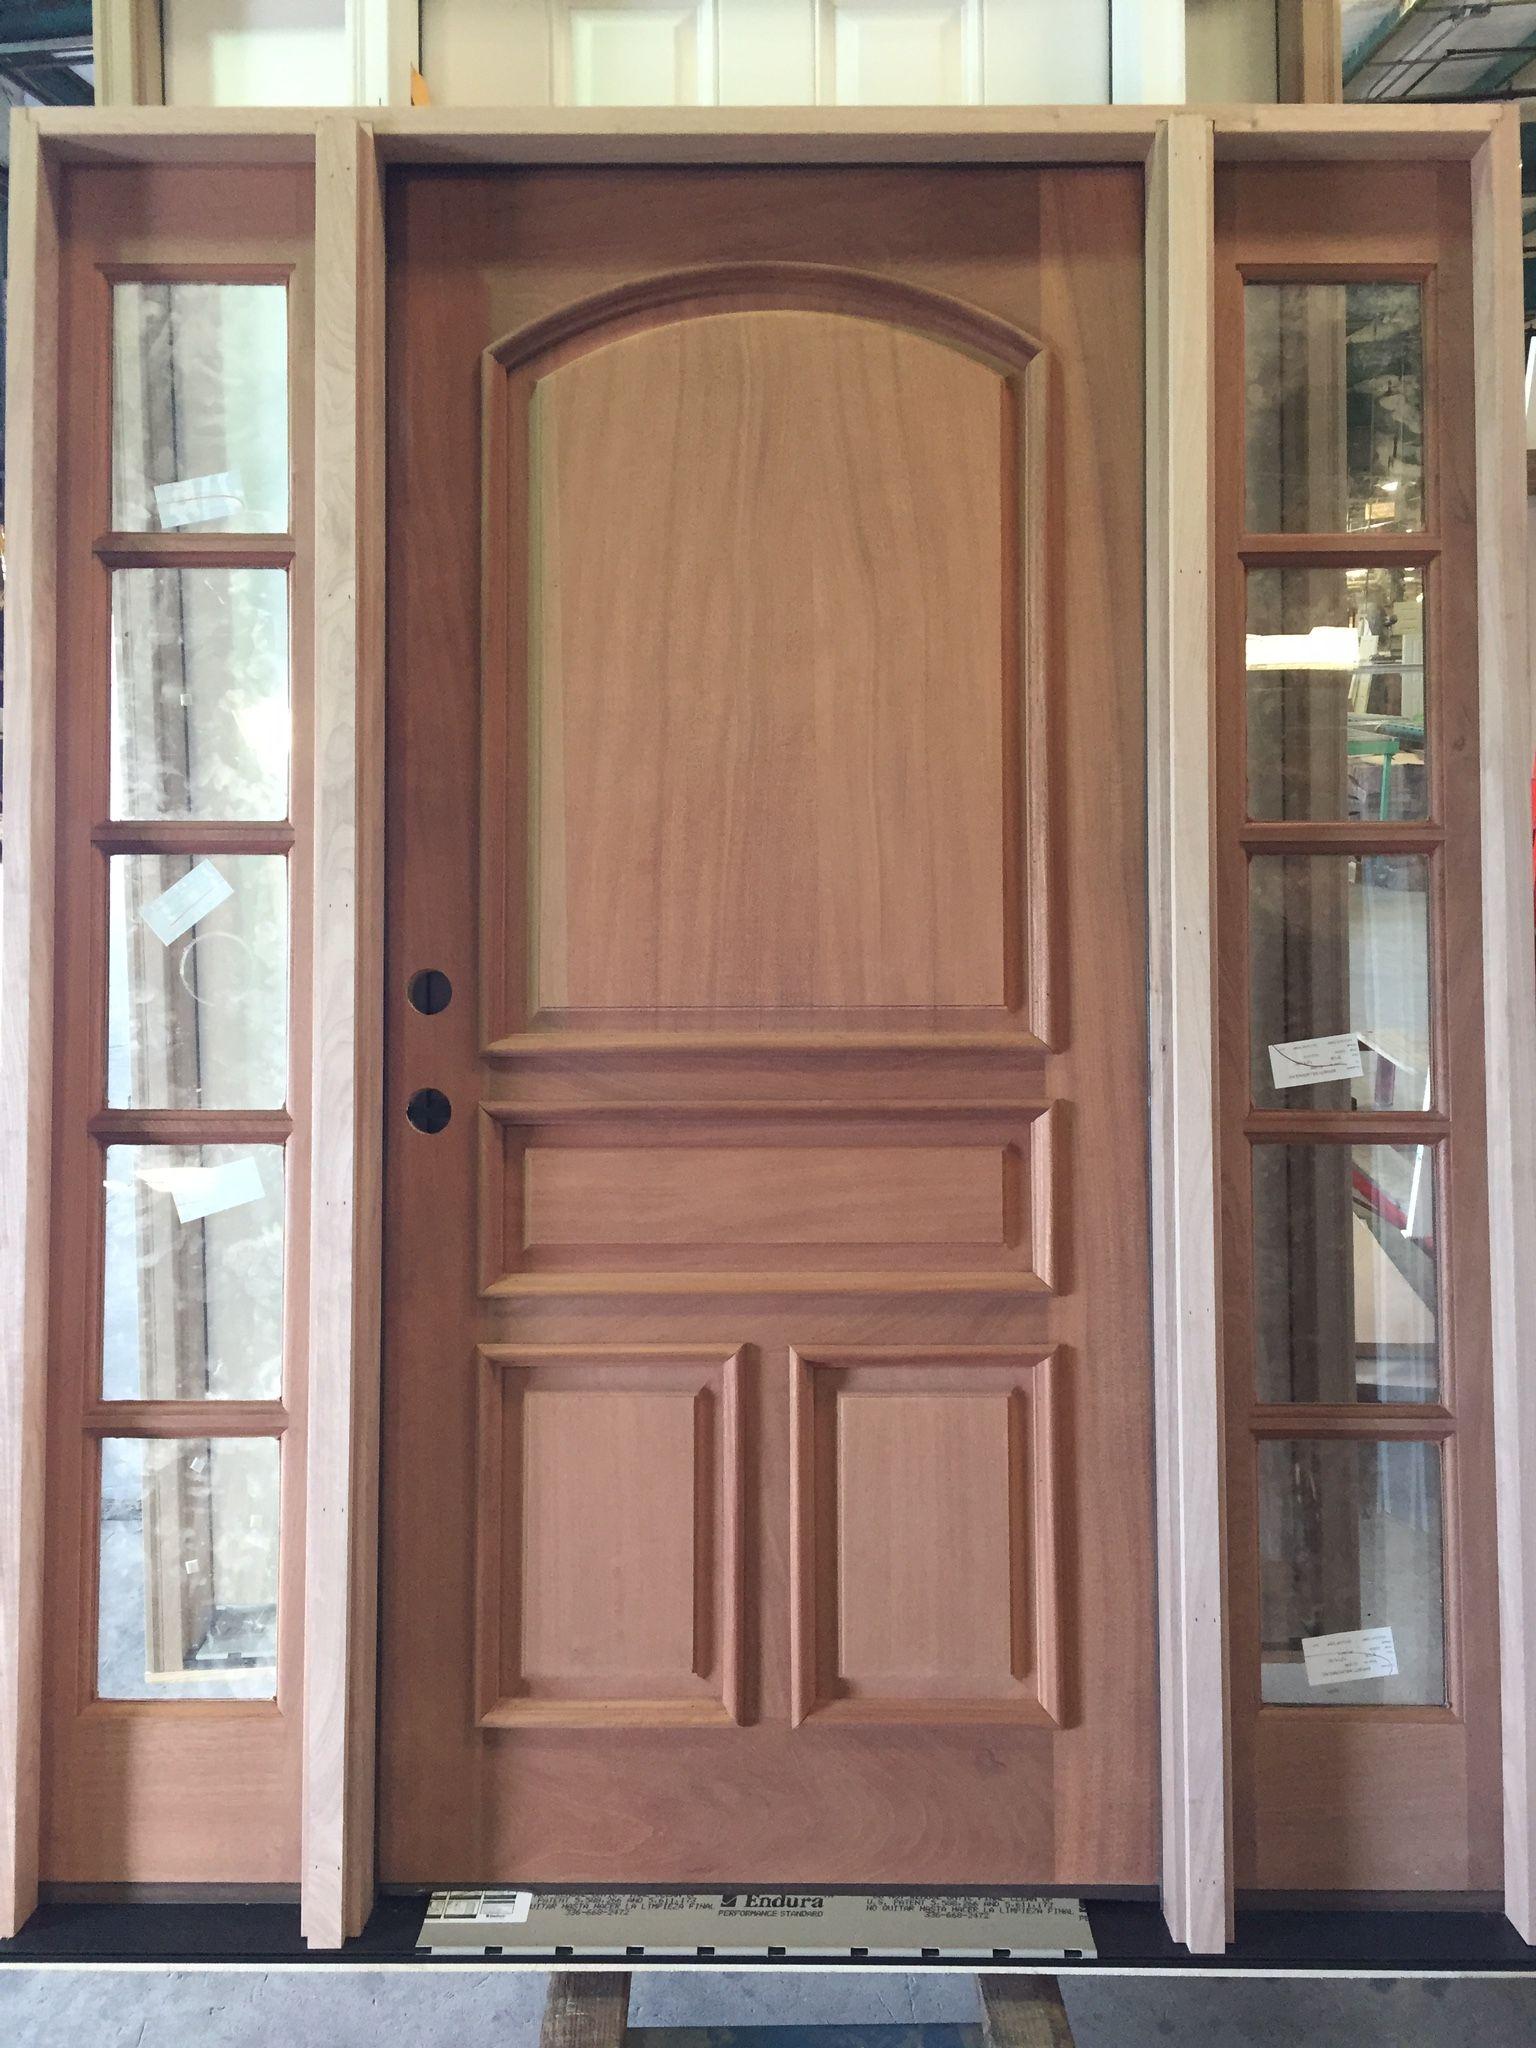 Sapele Mahogany Custom 4 Panel Exterior Door Unit With Raised Moulding  Around The Panels.